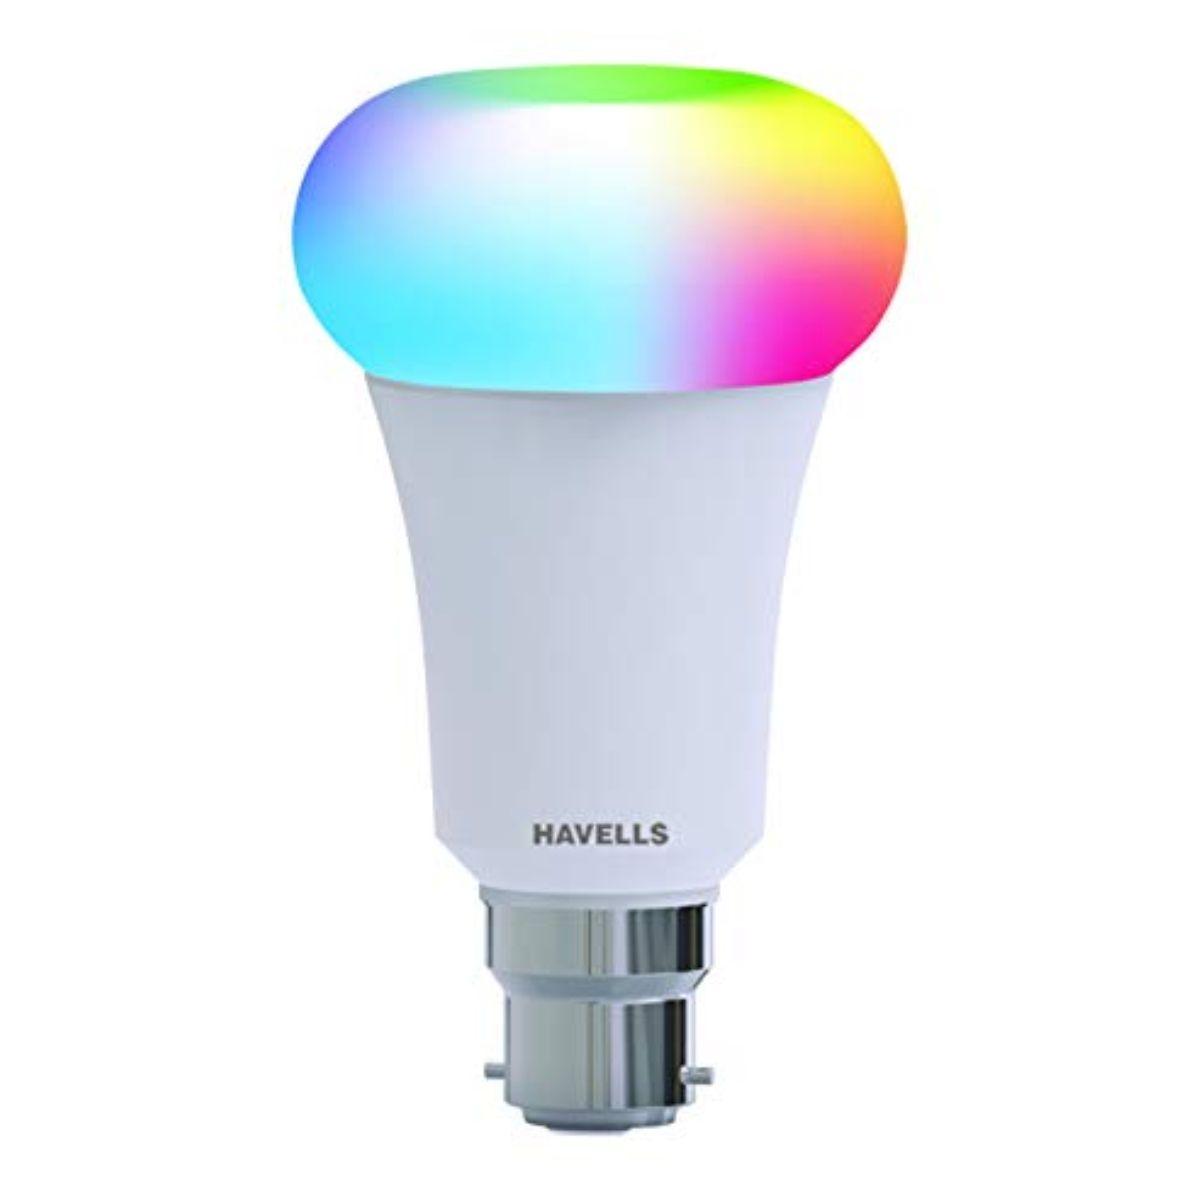 Havells Glamax 9W B22 Smart Bulb